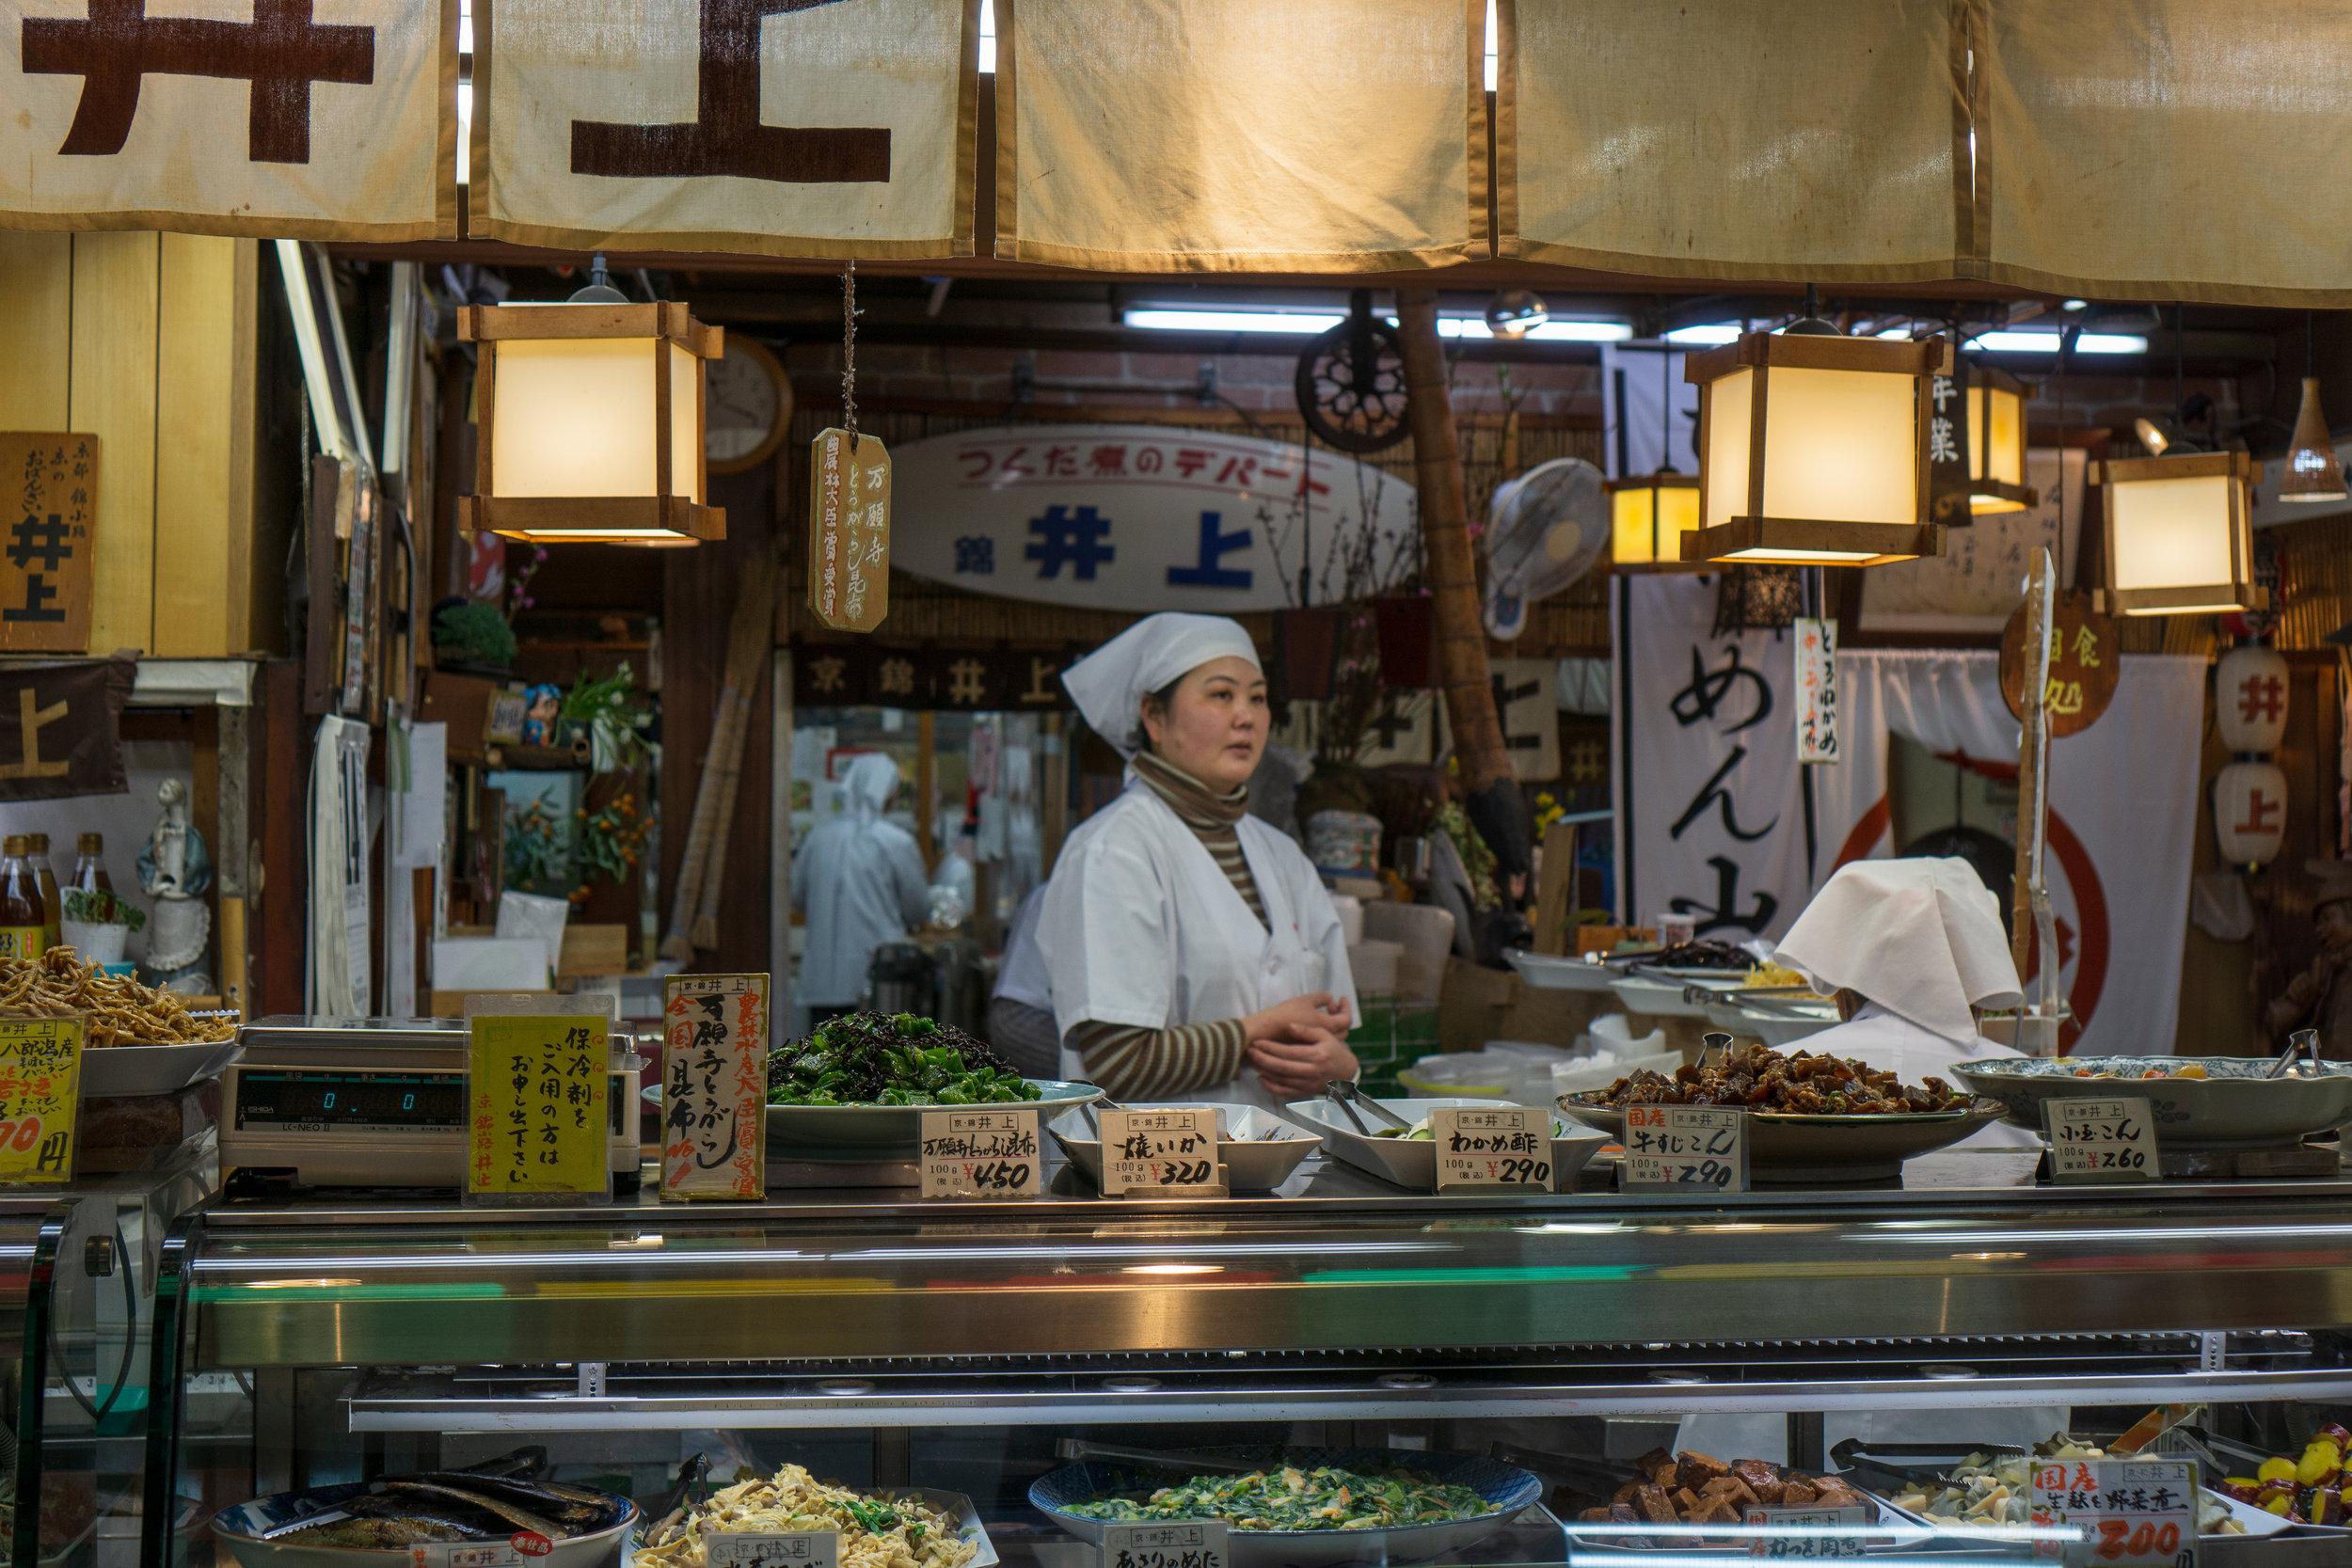 Nishiki Market, Kyoto, Japan (Mar 19)